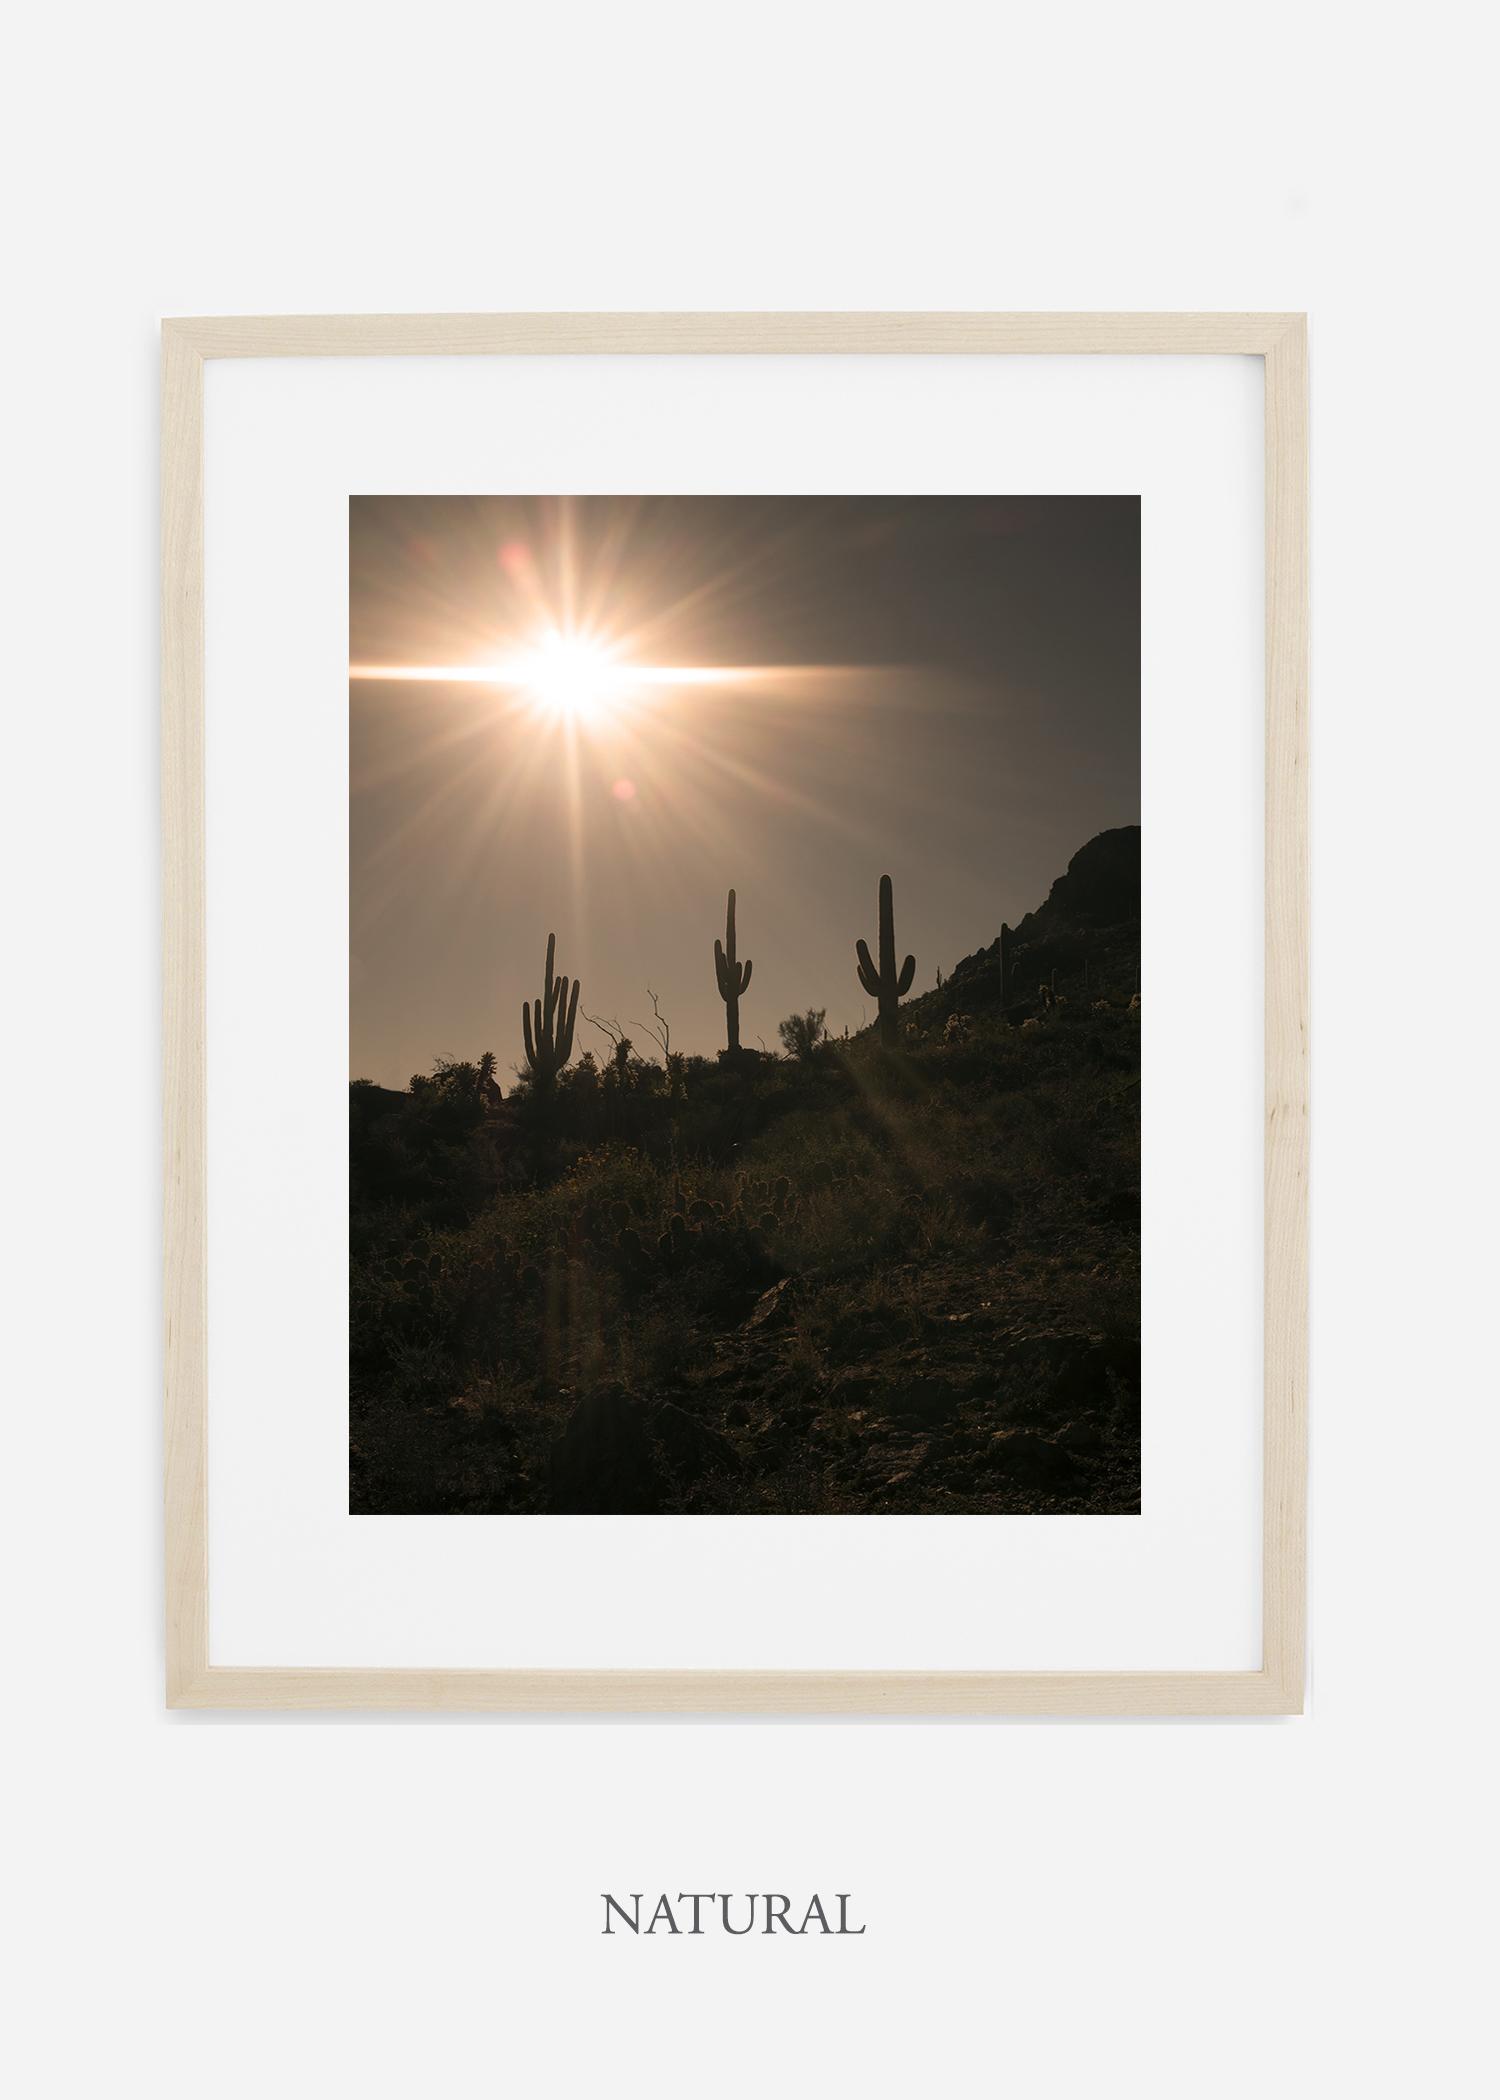 naturalframe-saguaroNo.16-wildercalifornia-art-wallart-cactusprint-homedecor-prints-arizona-botanical-artwork-interiordesign.jpg